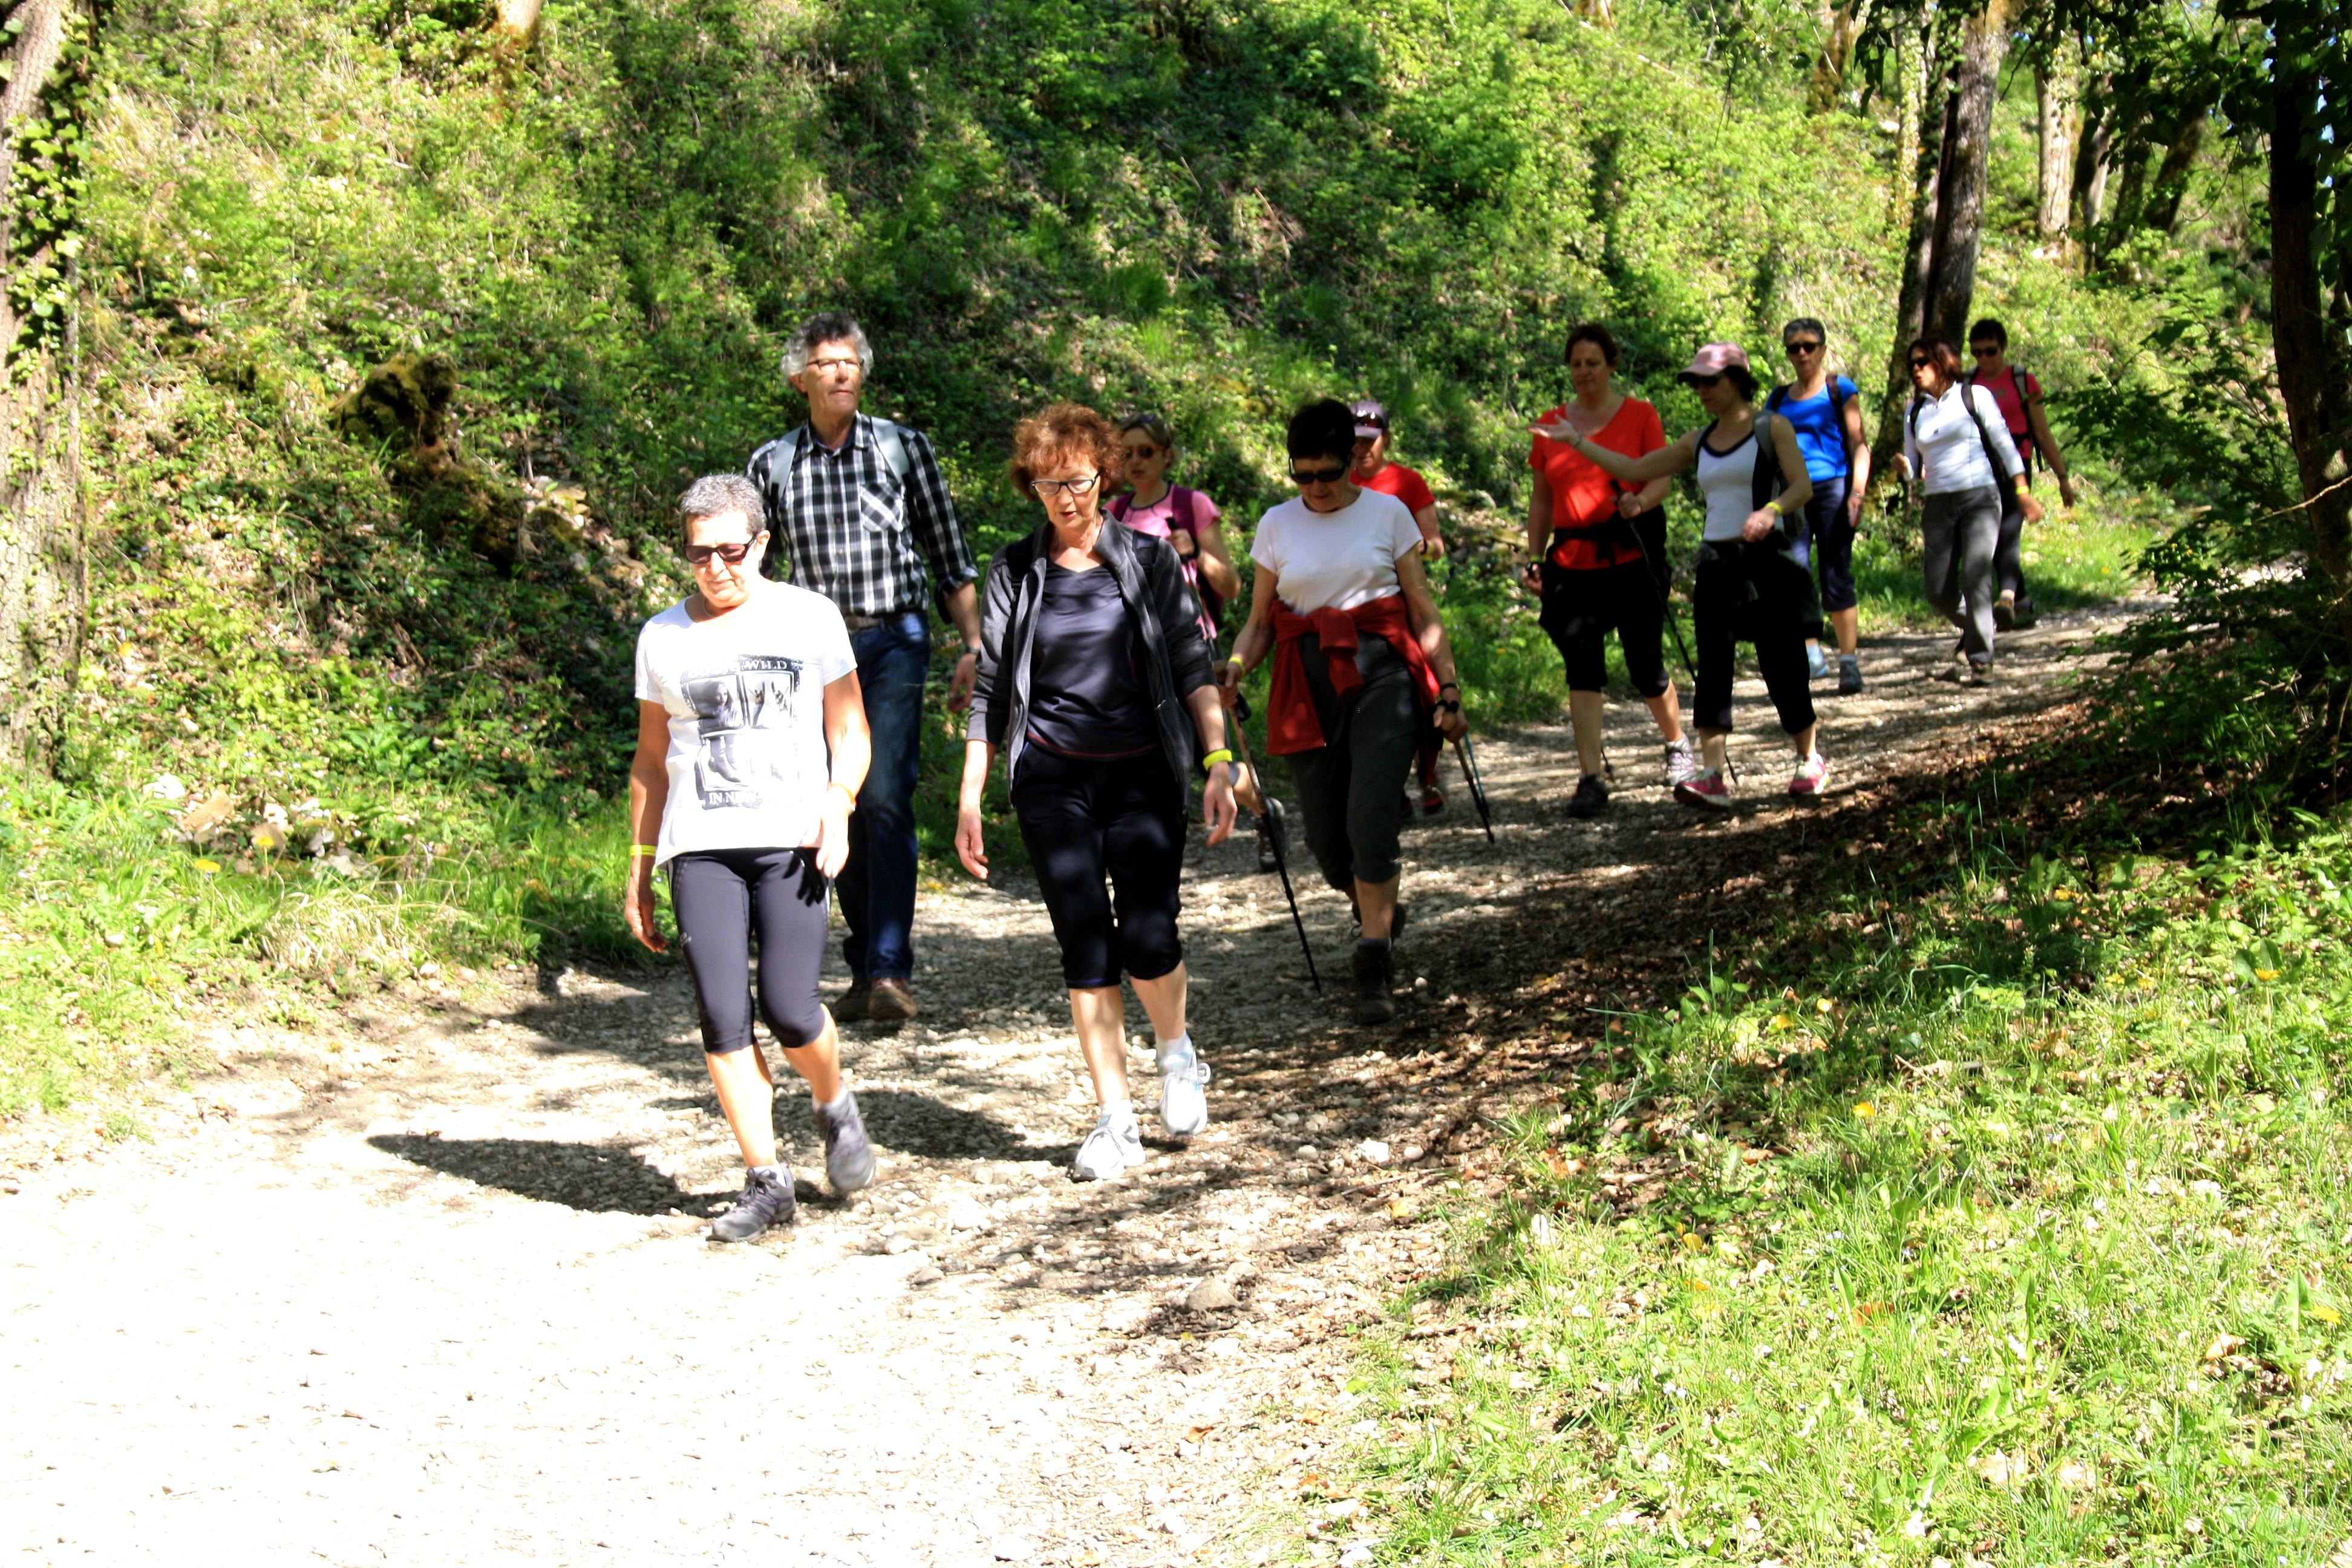 2017-04-09 - Trail-Montfaucon (246) - Copie